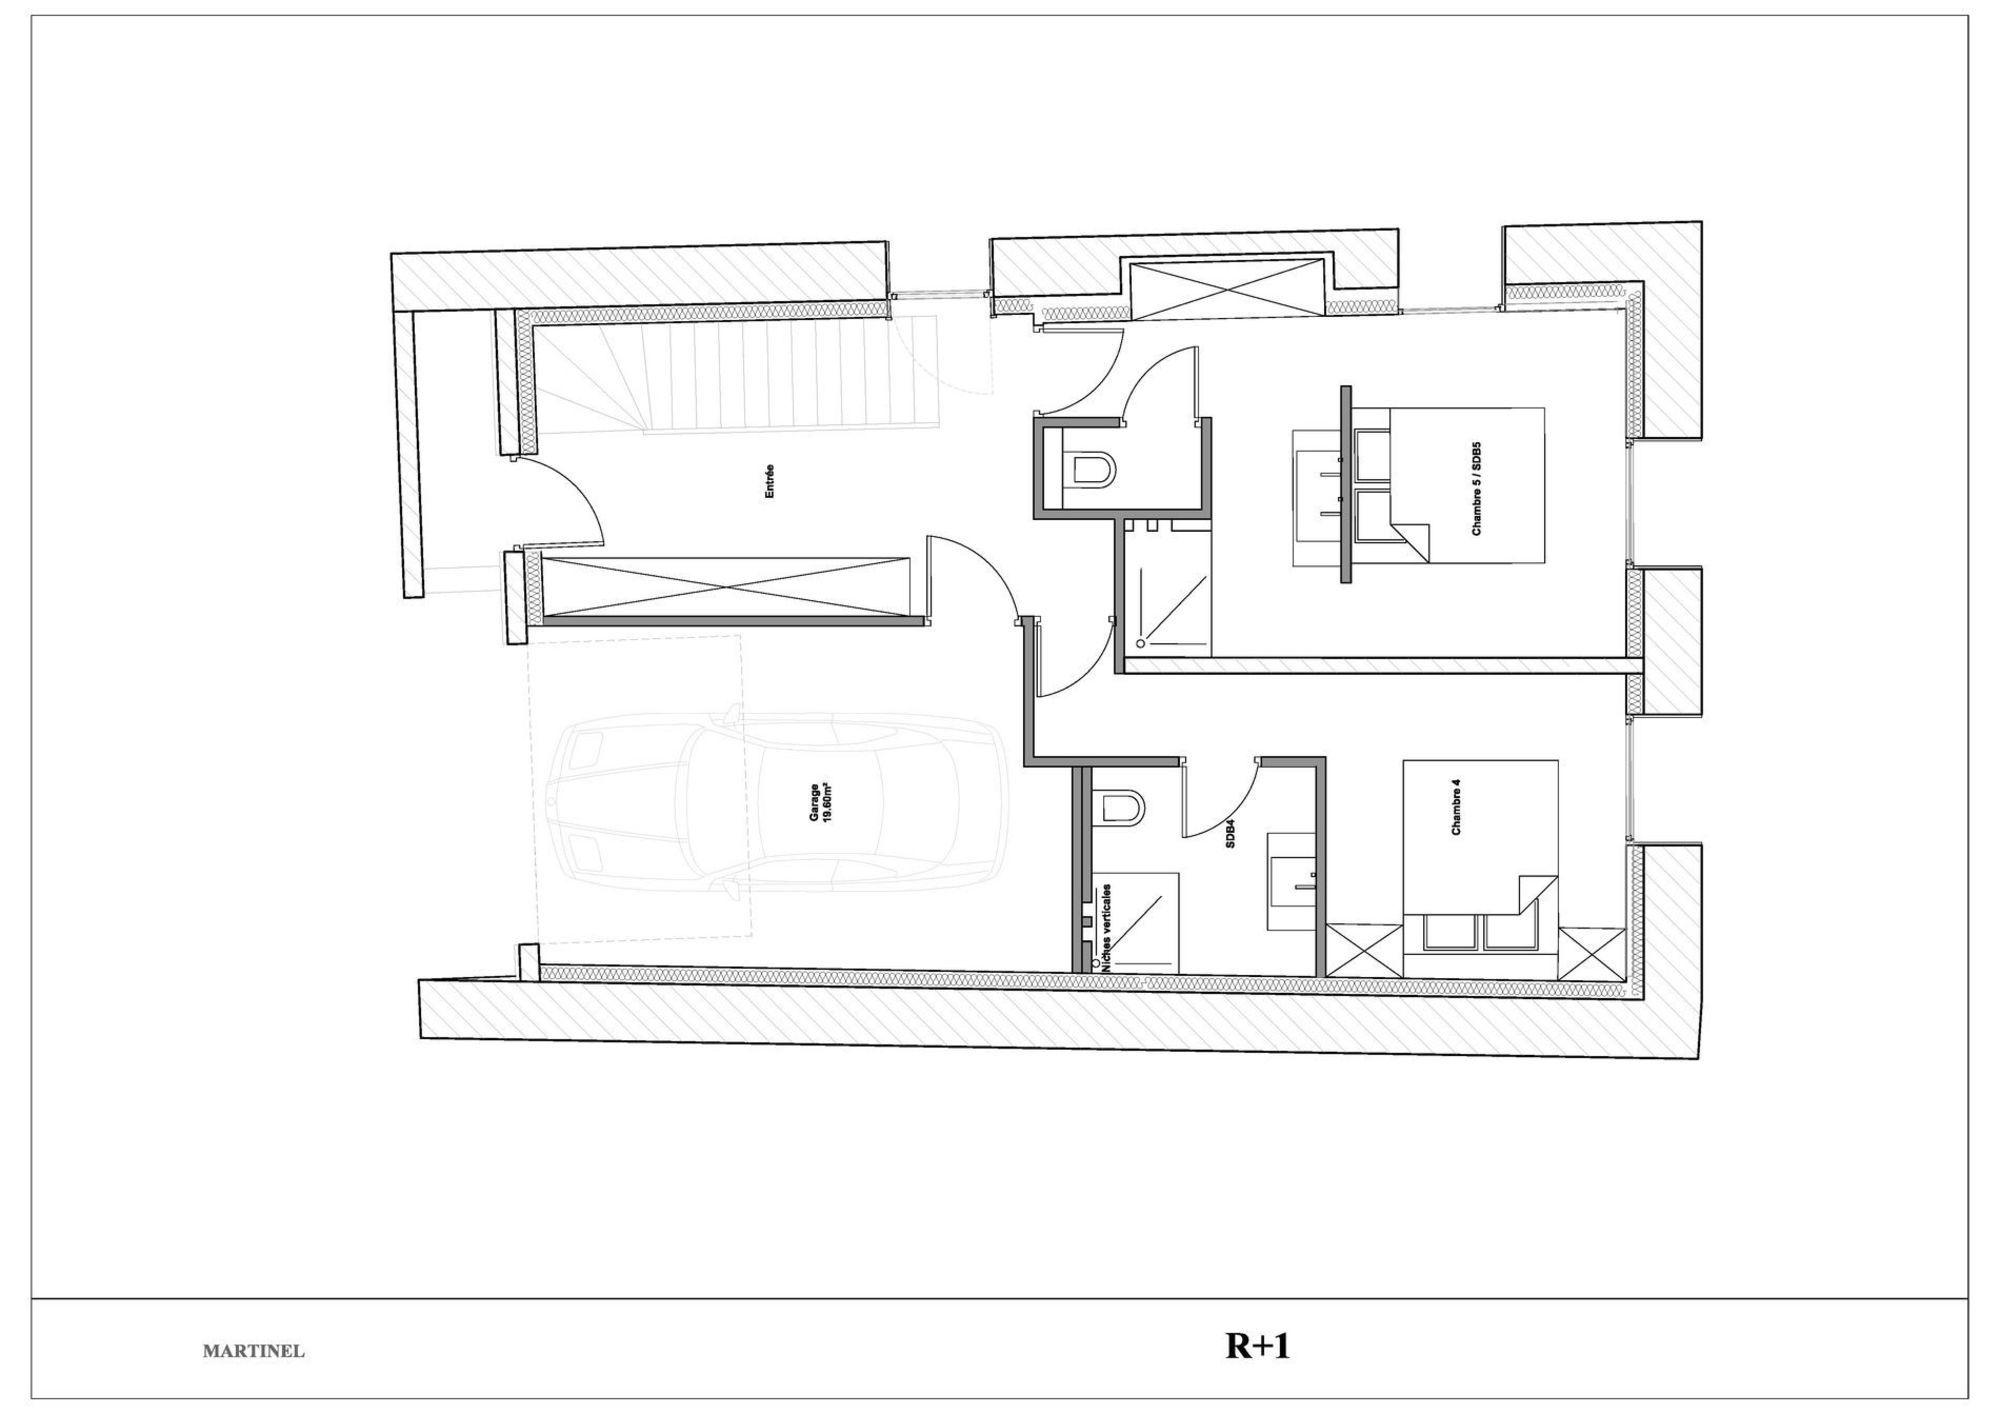 Chalet La Grange Martinel St-Martin-de-Belleville Floor Plan 2